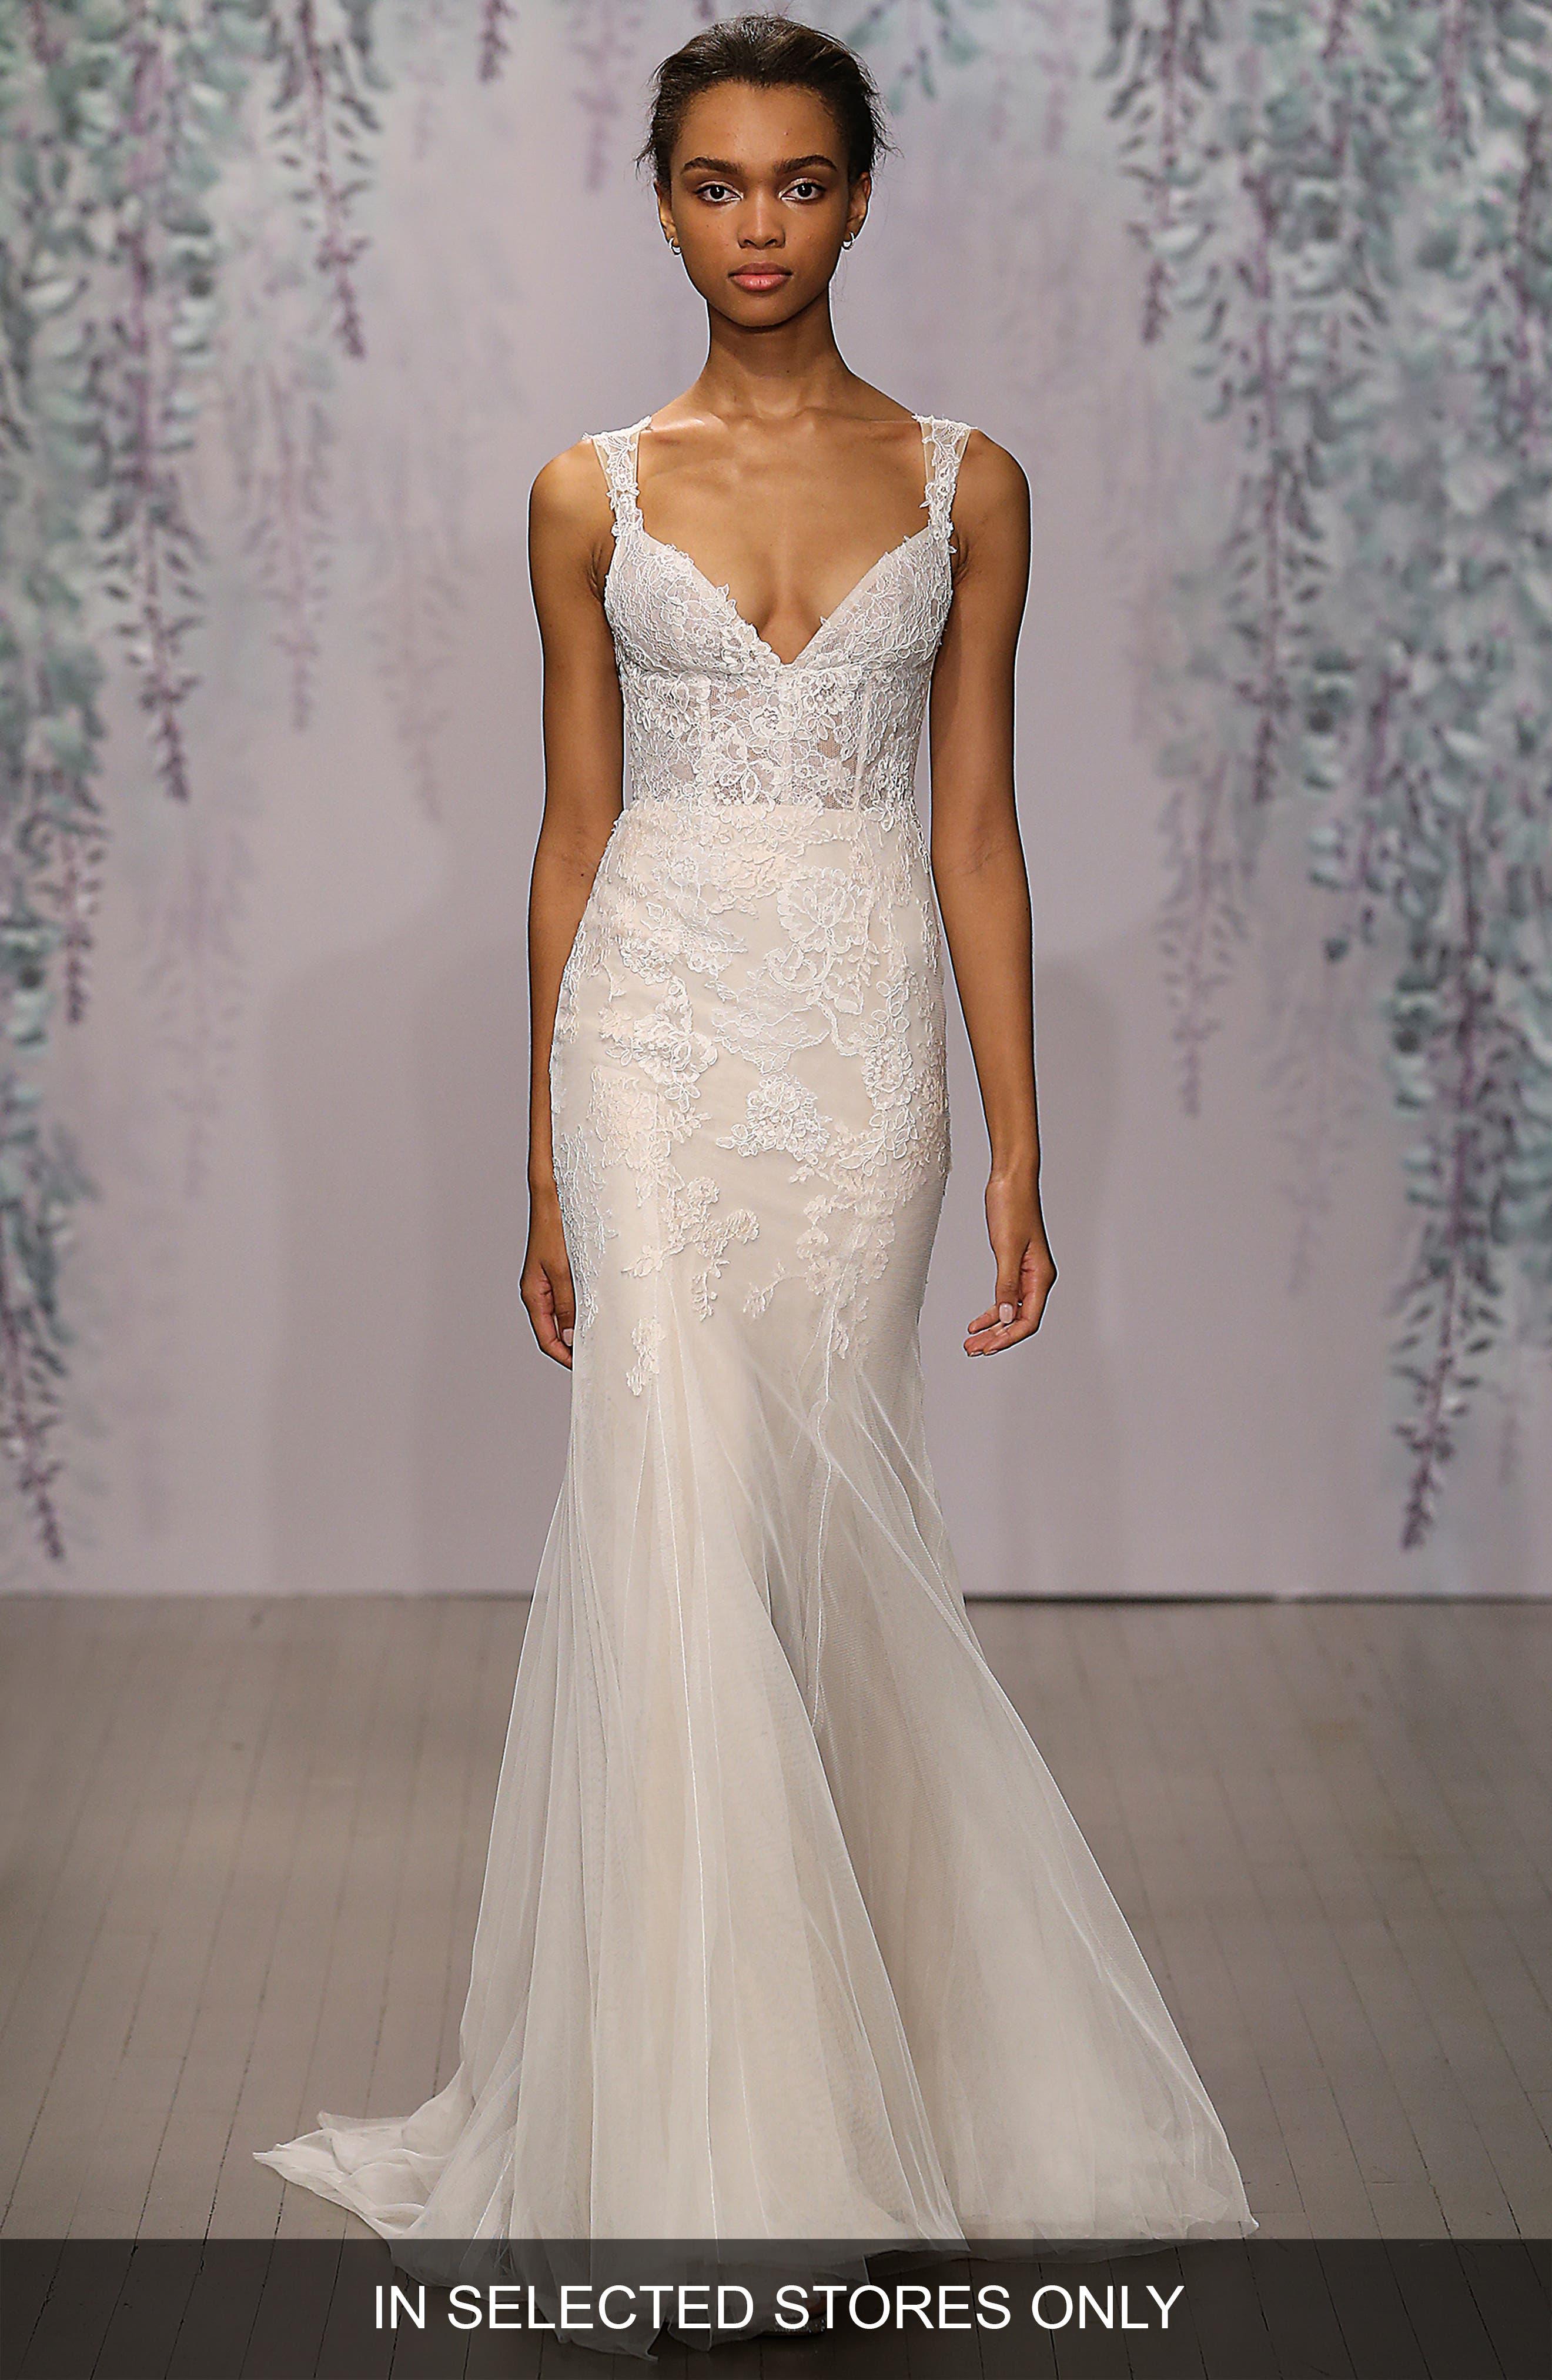 Dulce V-Neck Lace Tulle Sheath Dress,                             Alternate thumbnail 2, color,                             SILK WHITE/ SORBET